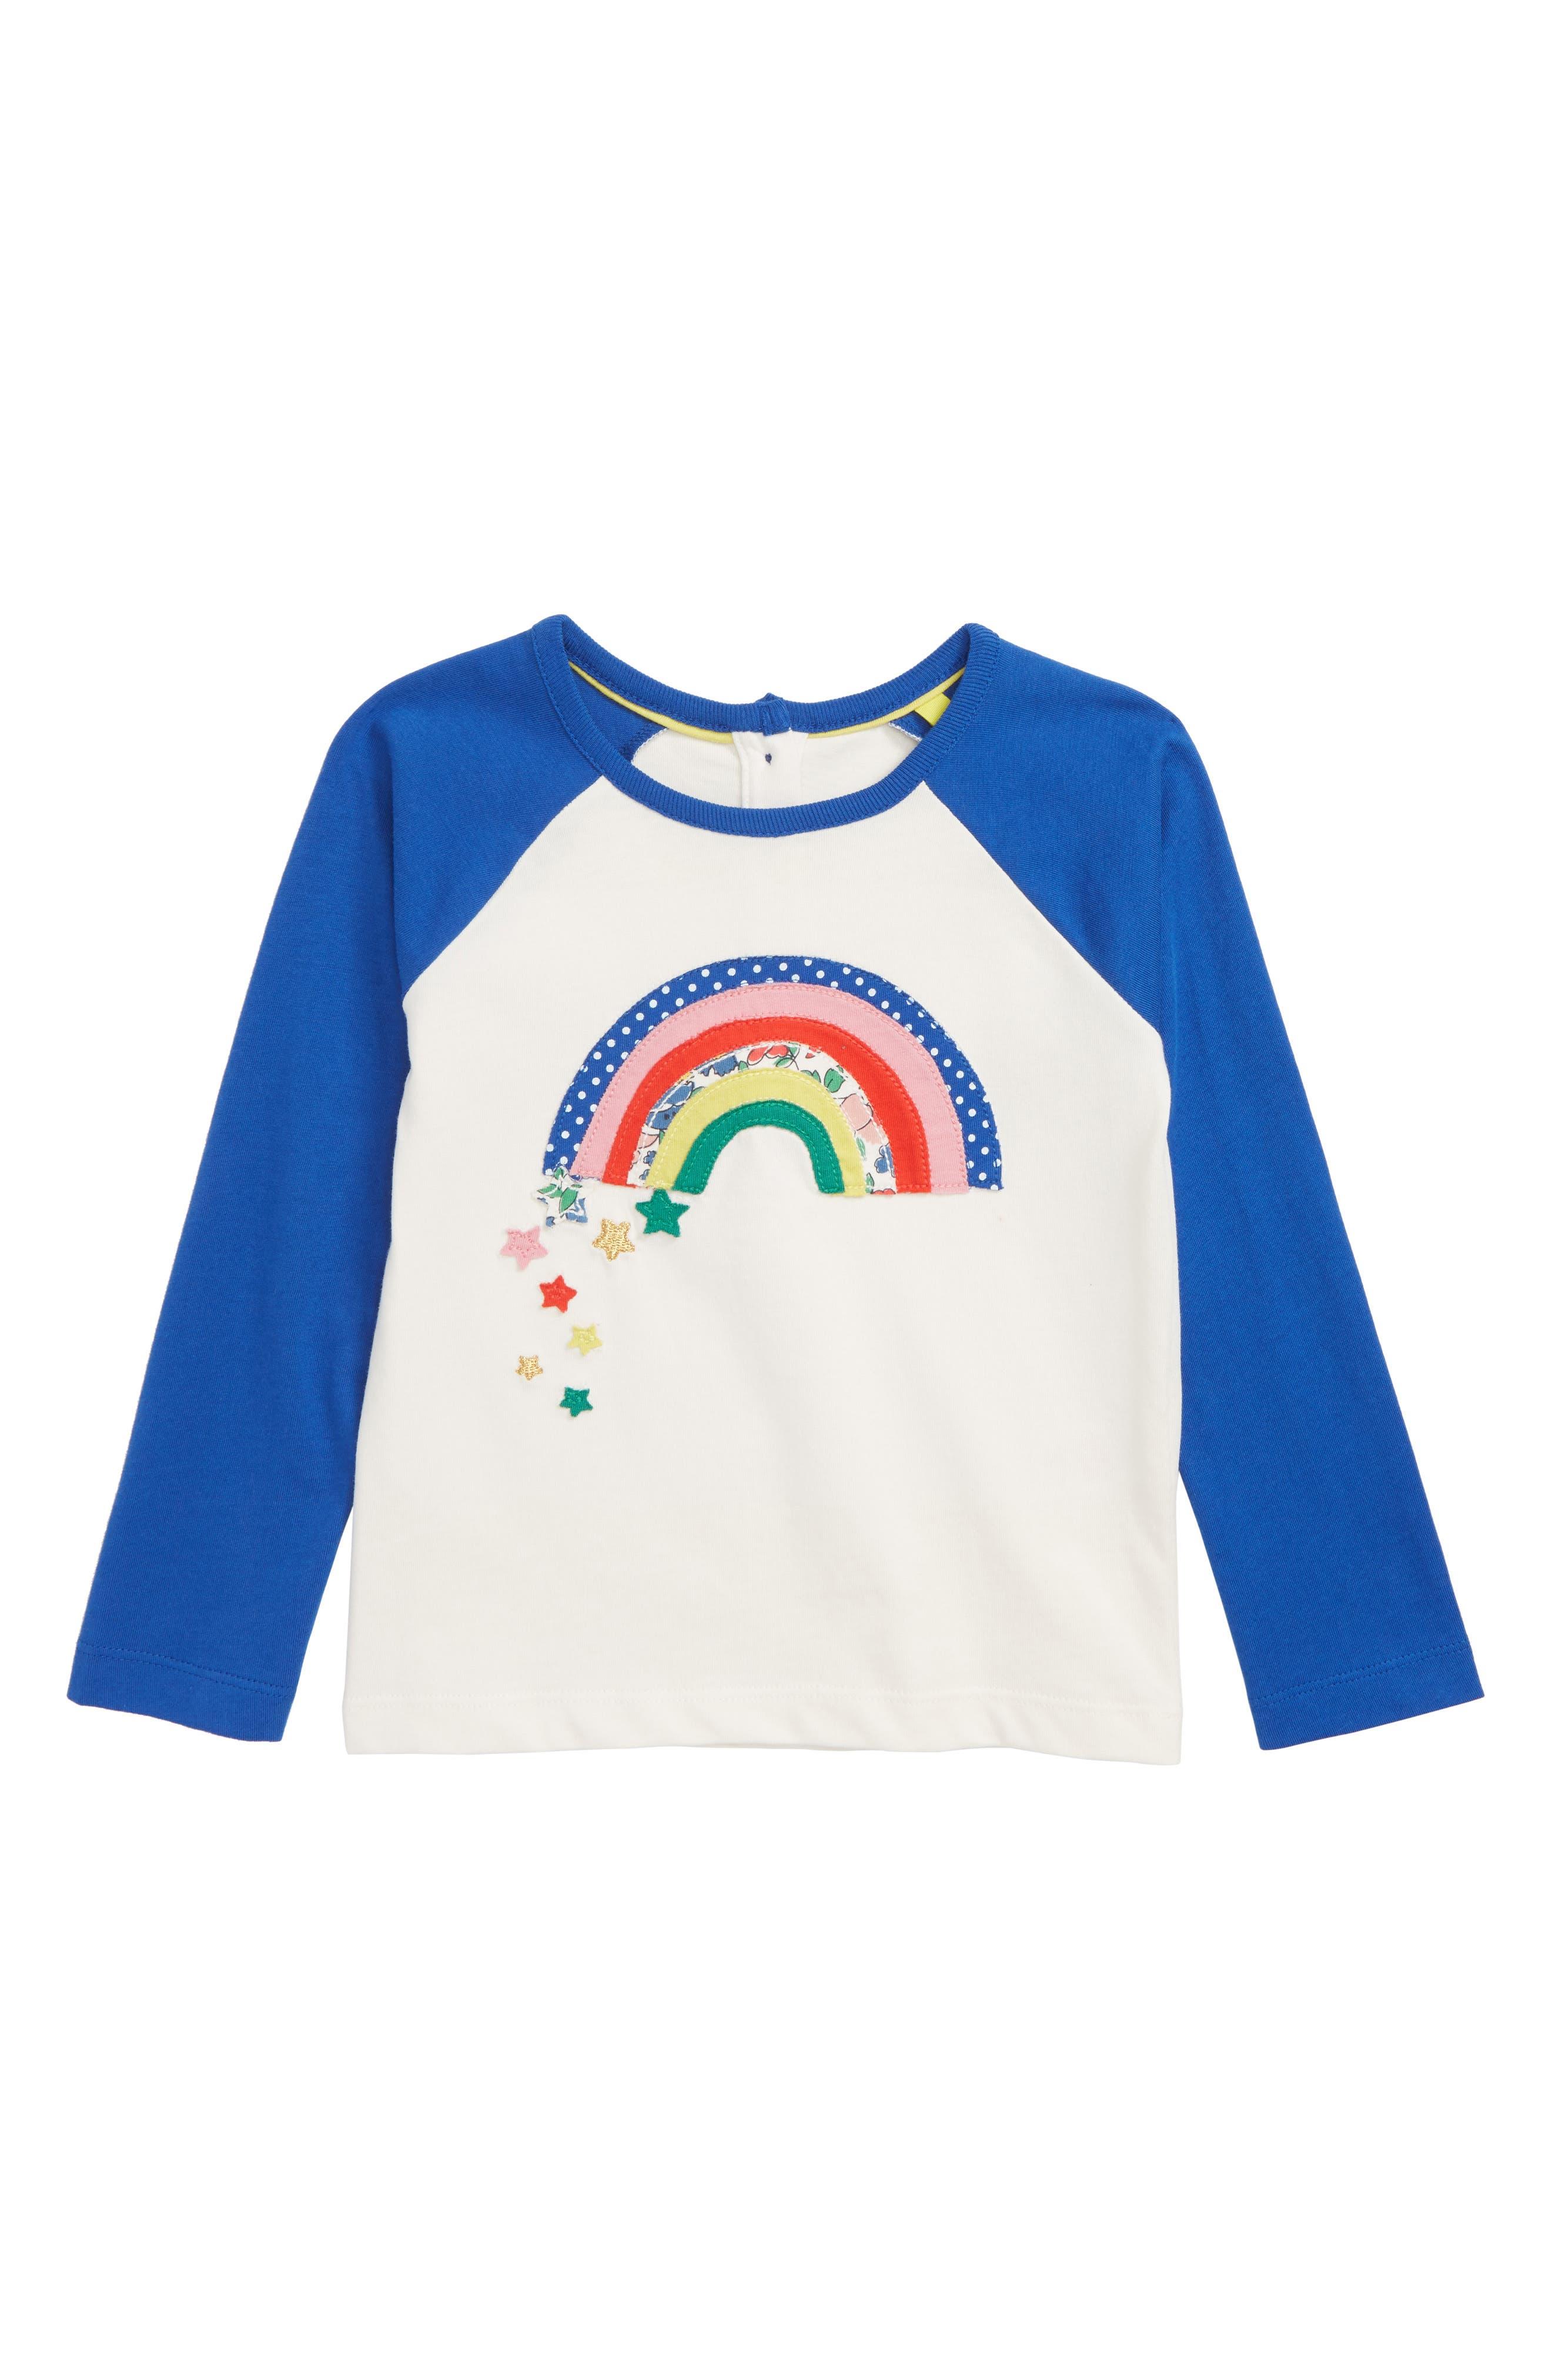 MINI BODEN Rainbow Appliqué Raglan Shirt, Main, color, 900